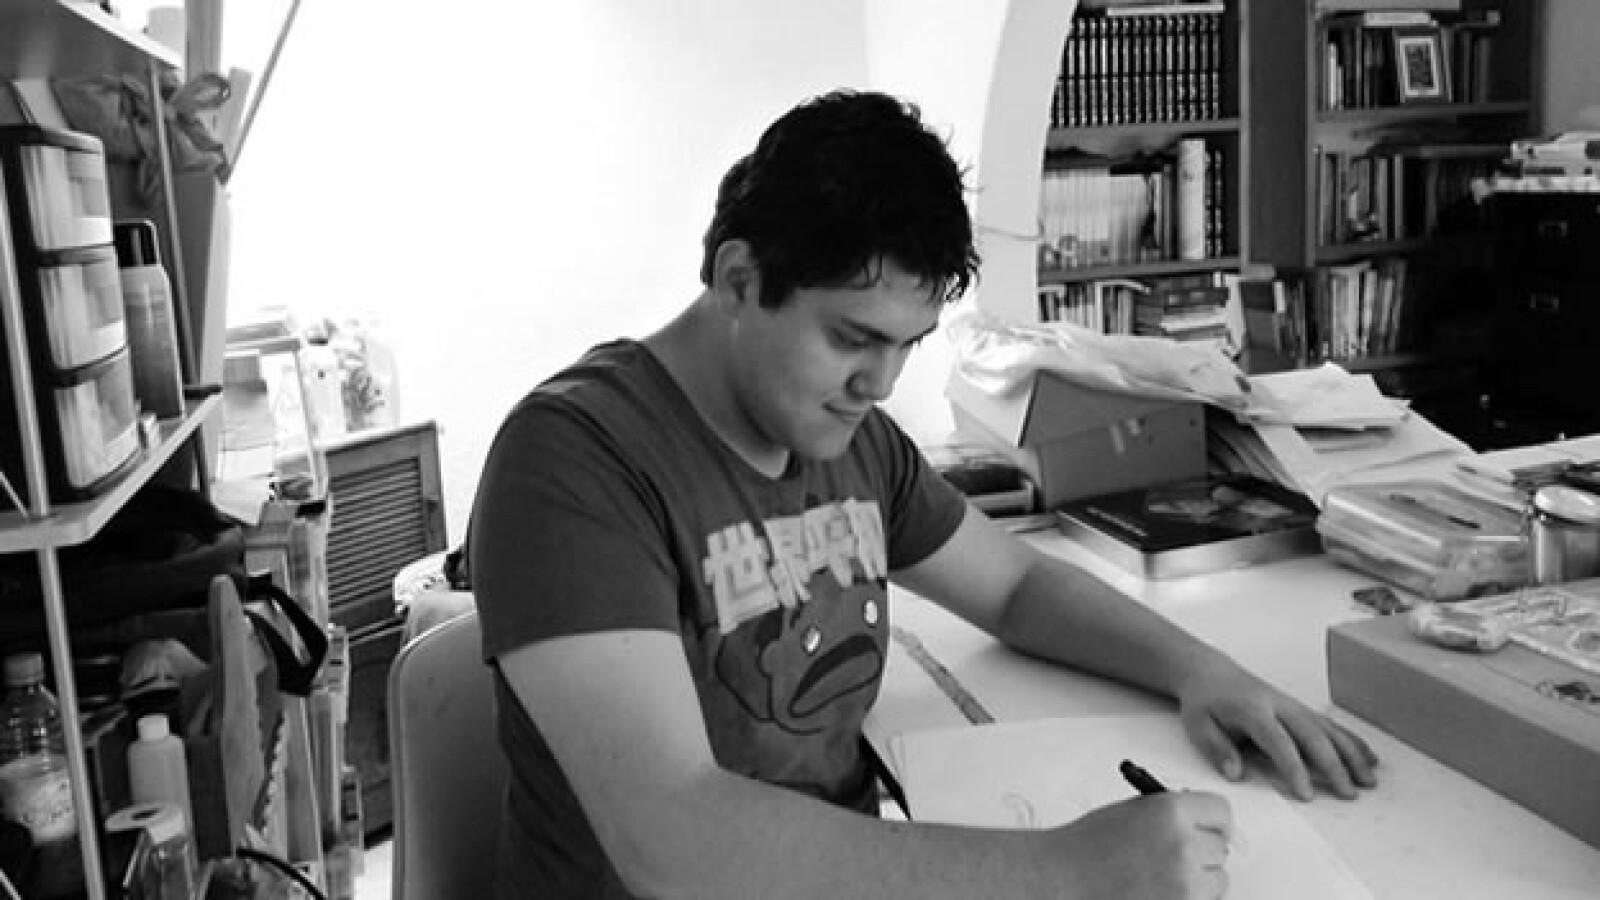 Jose Gilberto Gonzalez Mendez, ganador del premio braun 2012